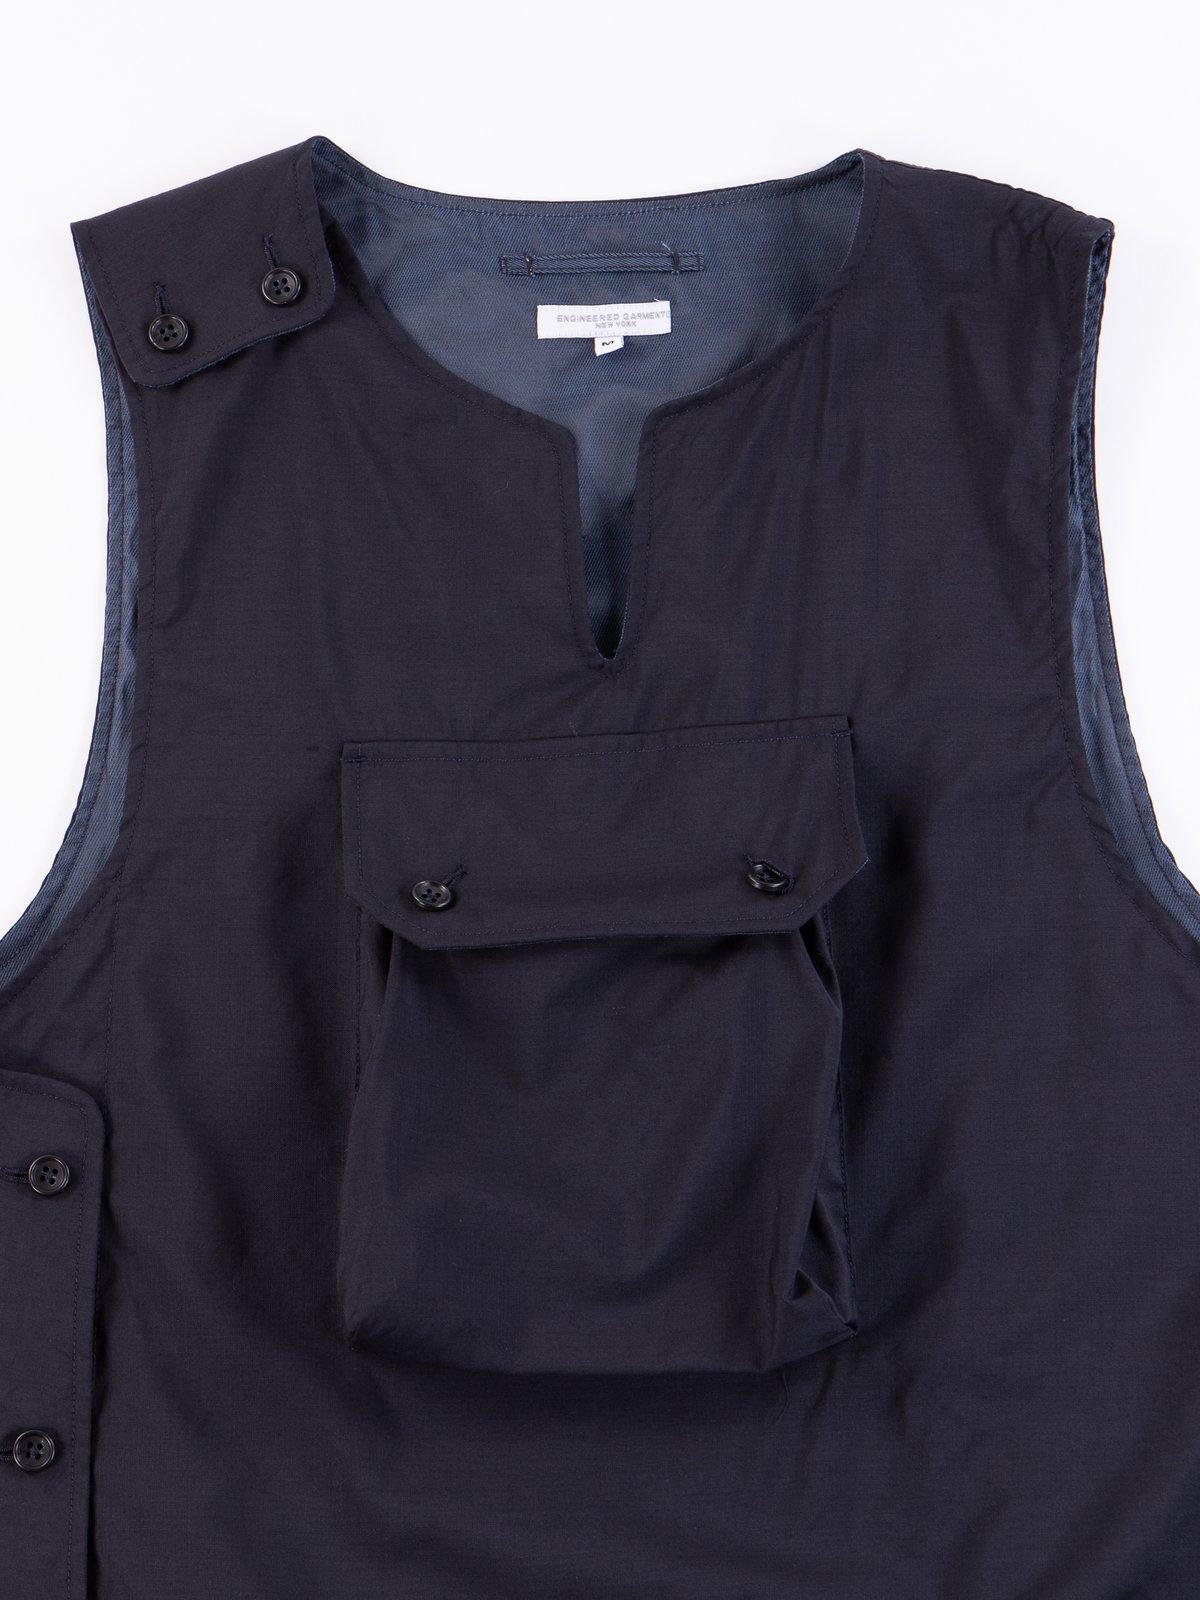 Dark Navy Tropical Wool Cover Vest - Image 3